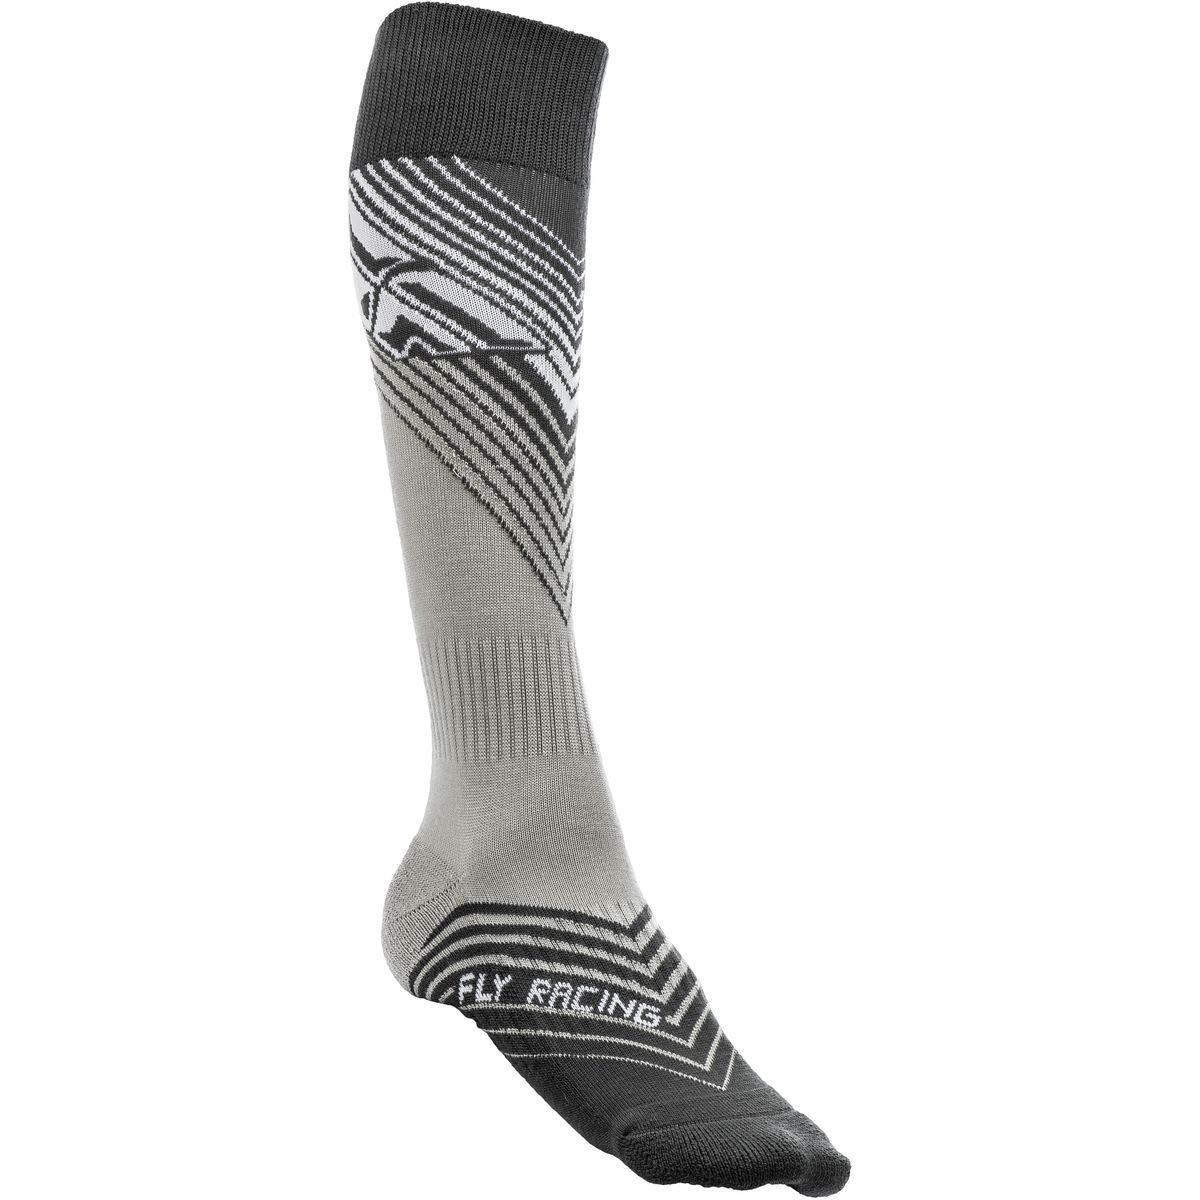 Fly Racing Unisex-Adult Mix Socks Thin (Black/White, Youth)